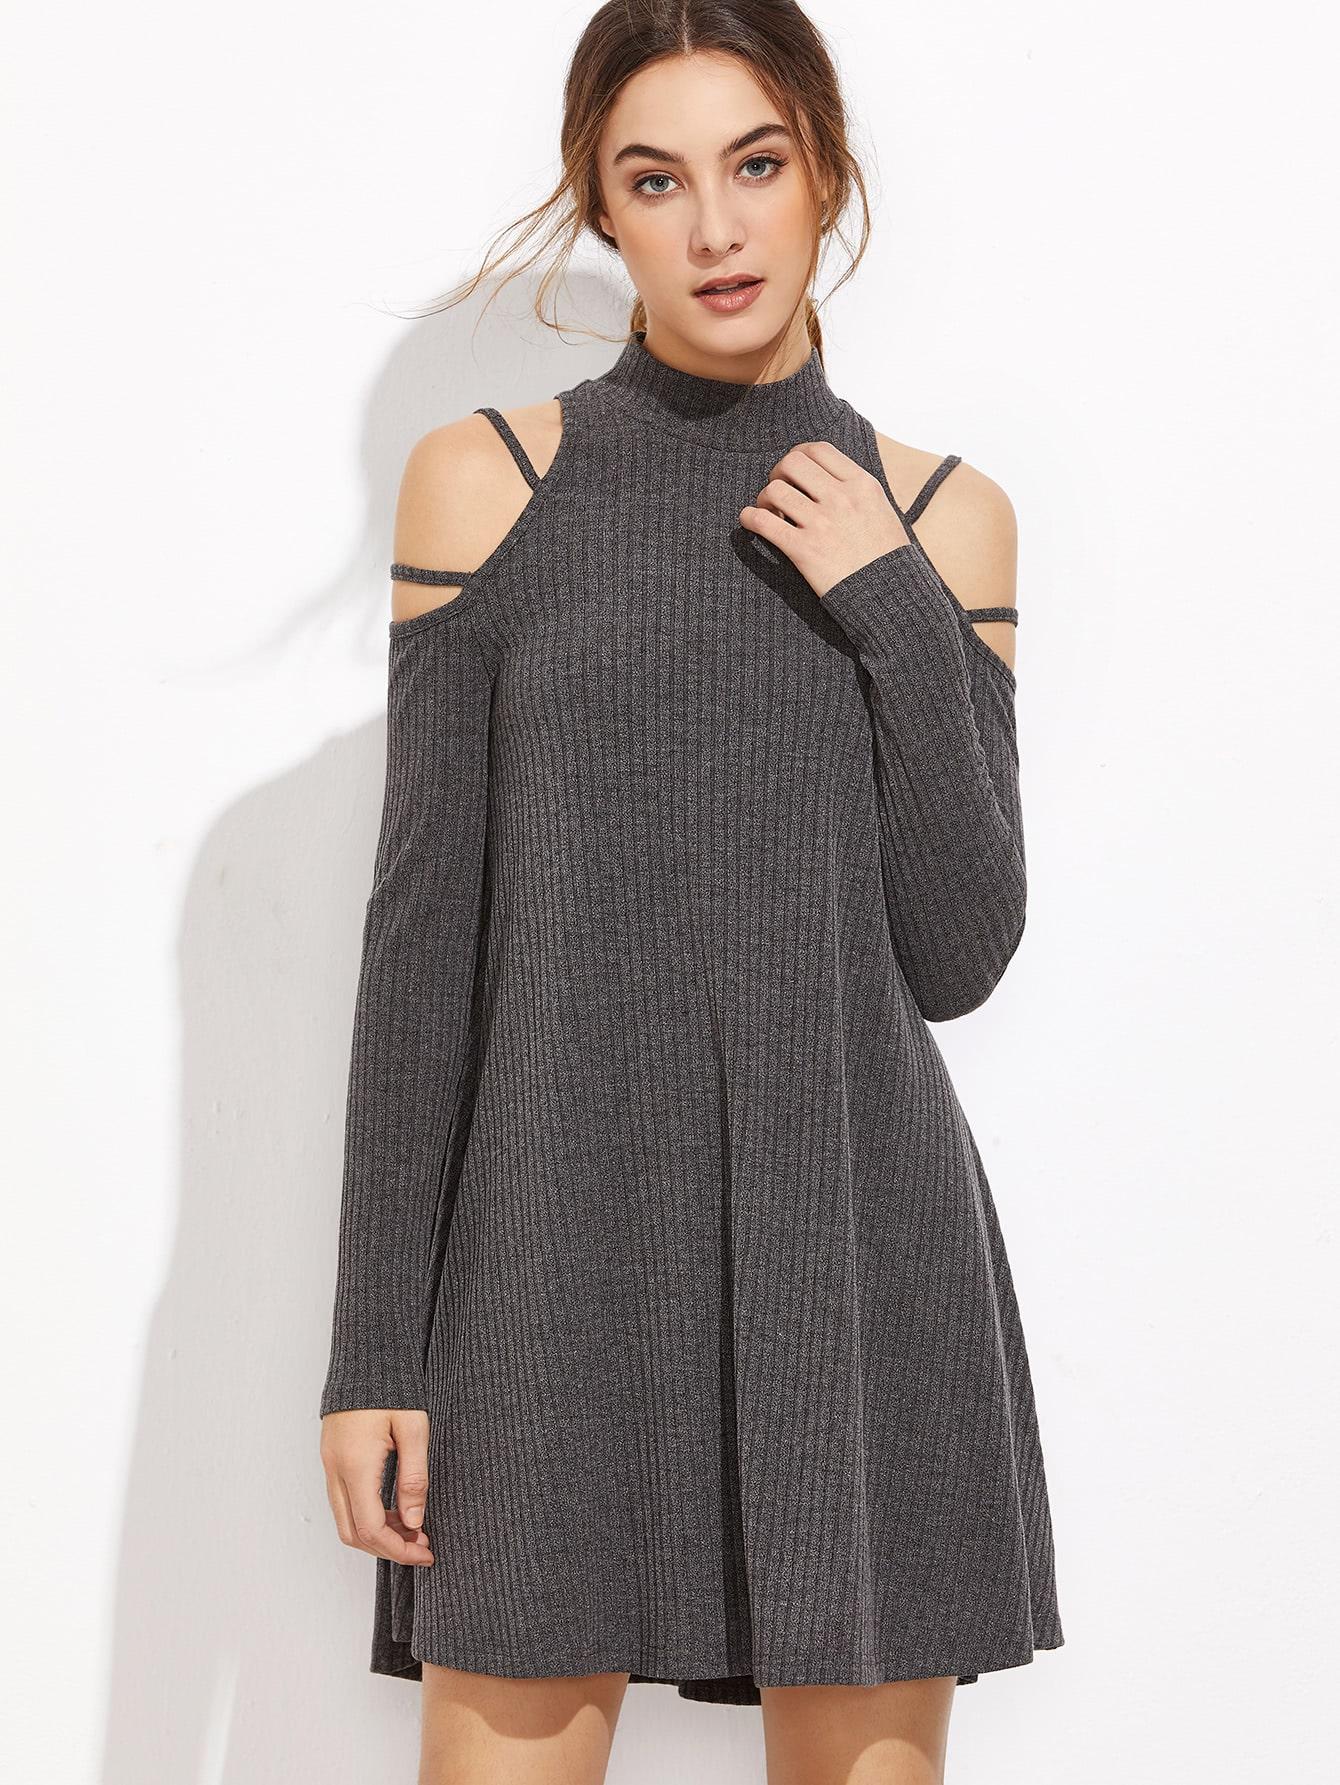 Ribbed Knit Strappy Cold Shoulder Dress dress161101704